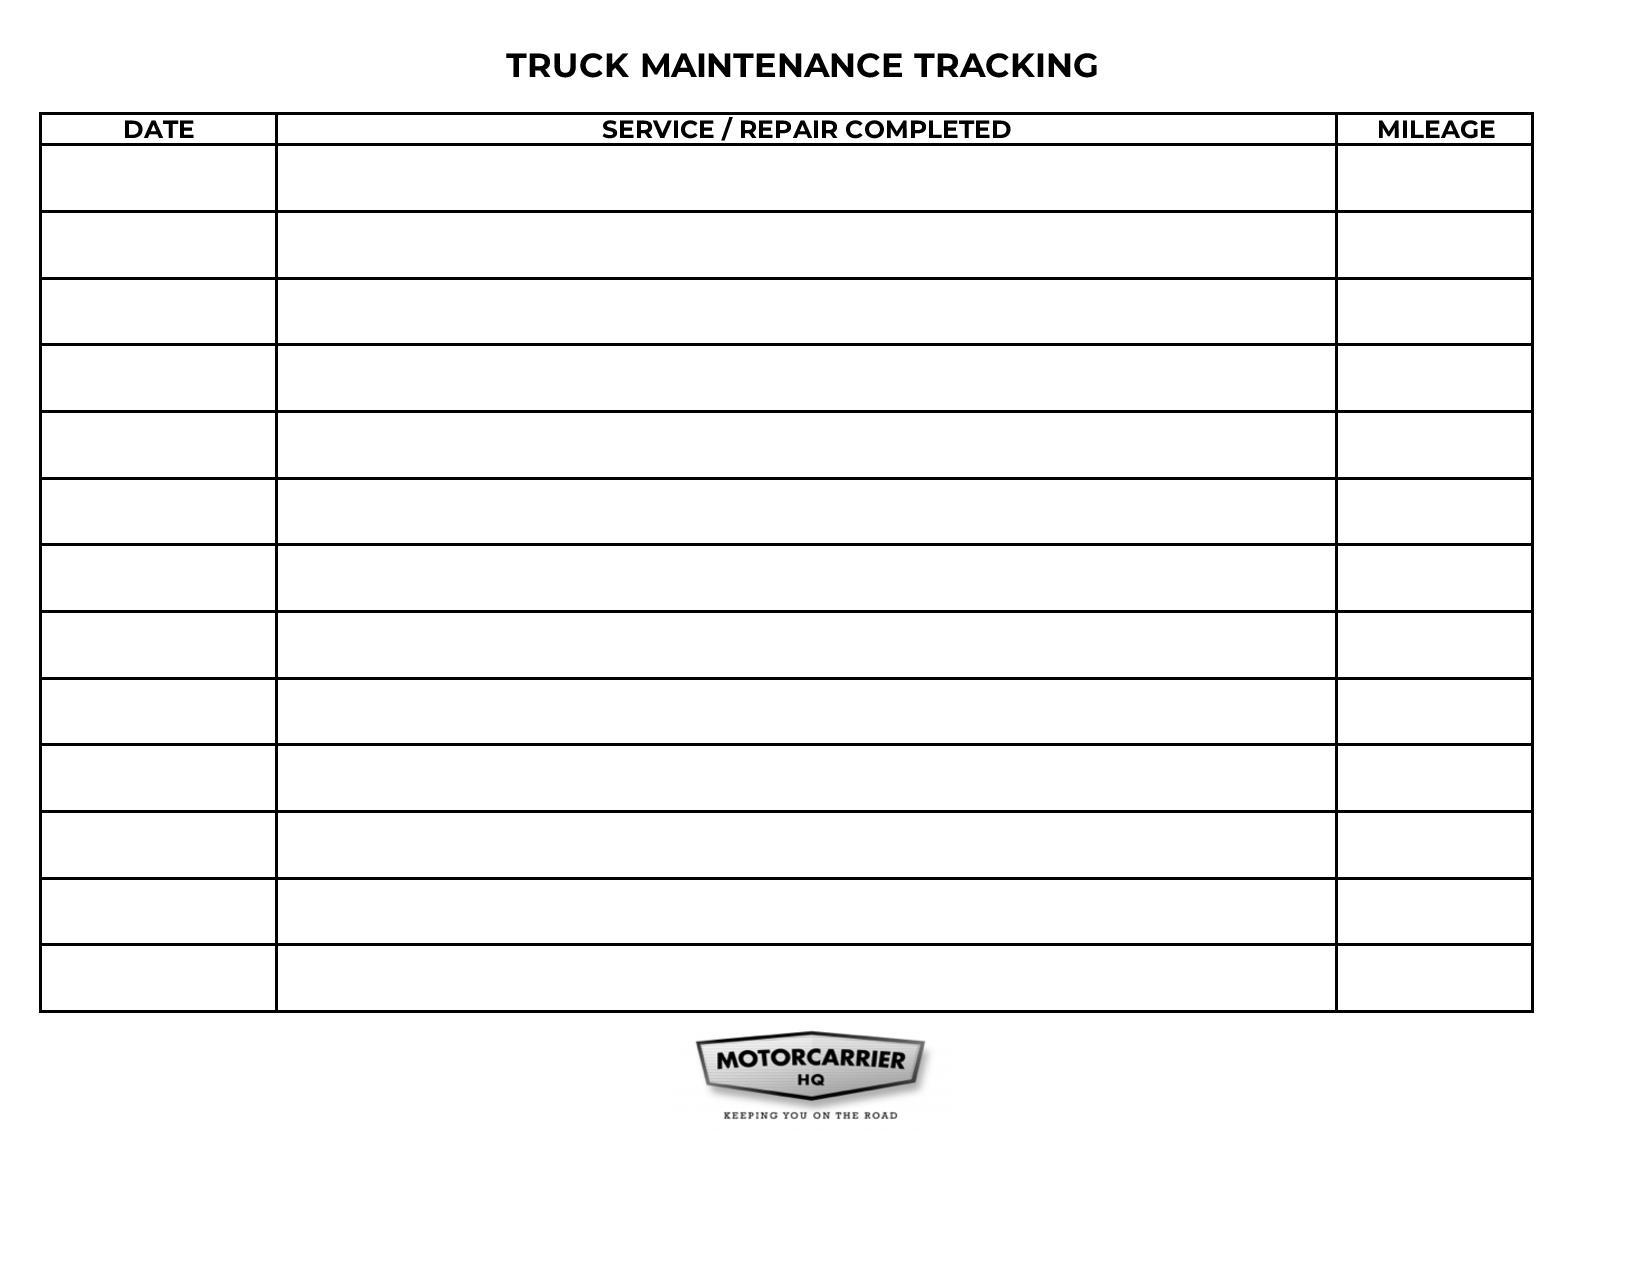 Truck maintenance tracking sheet